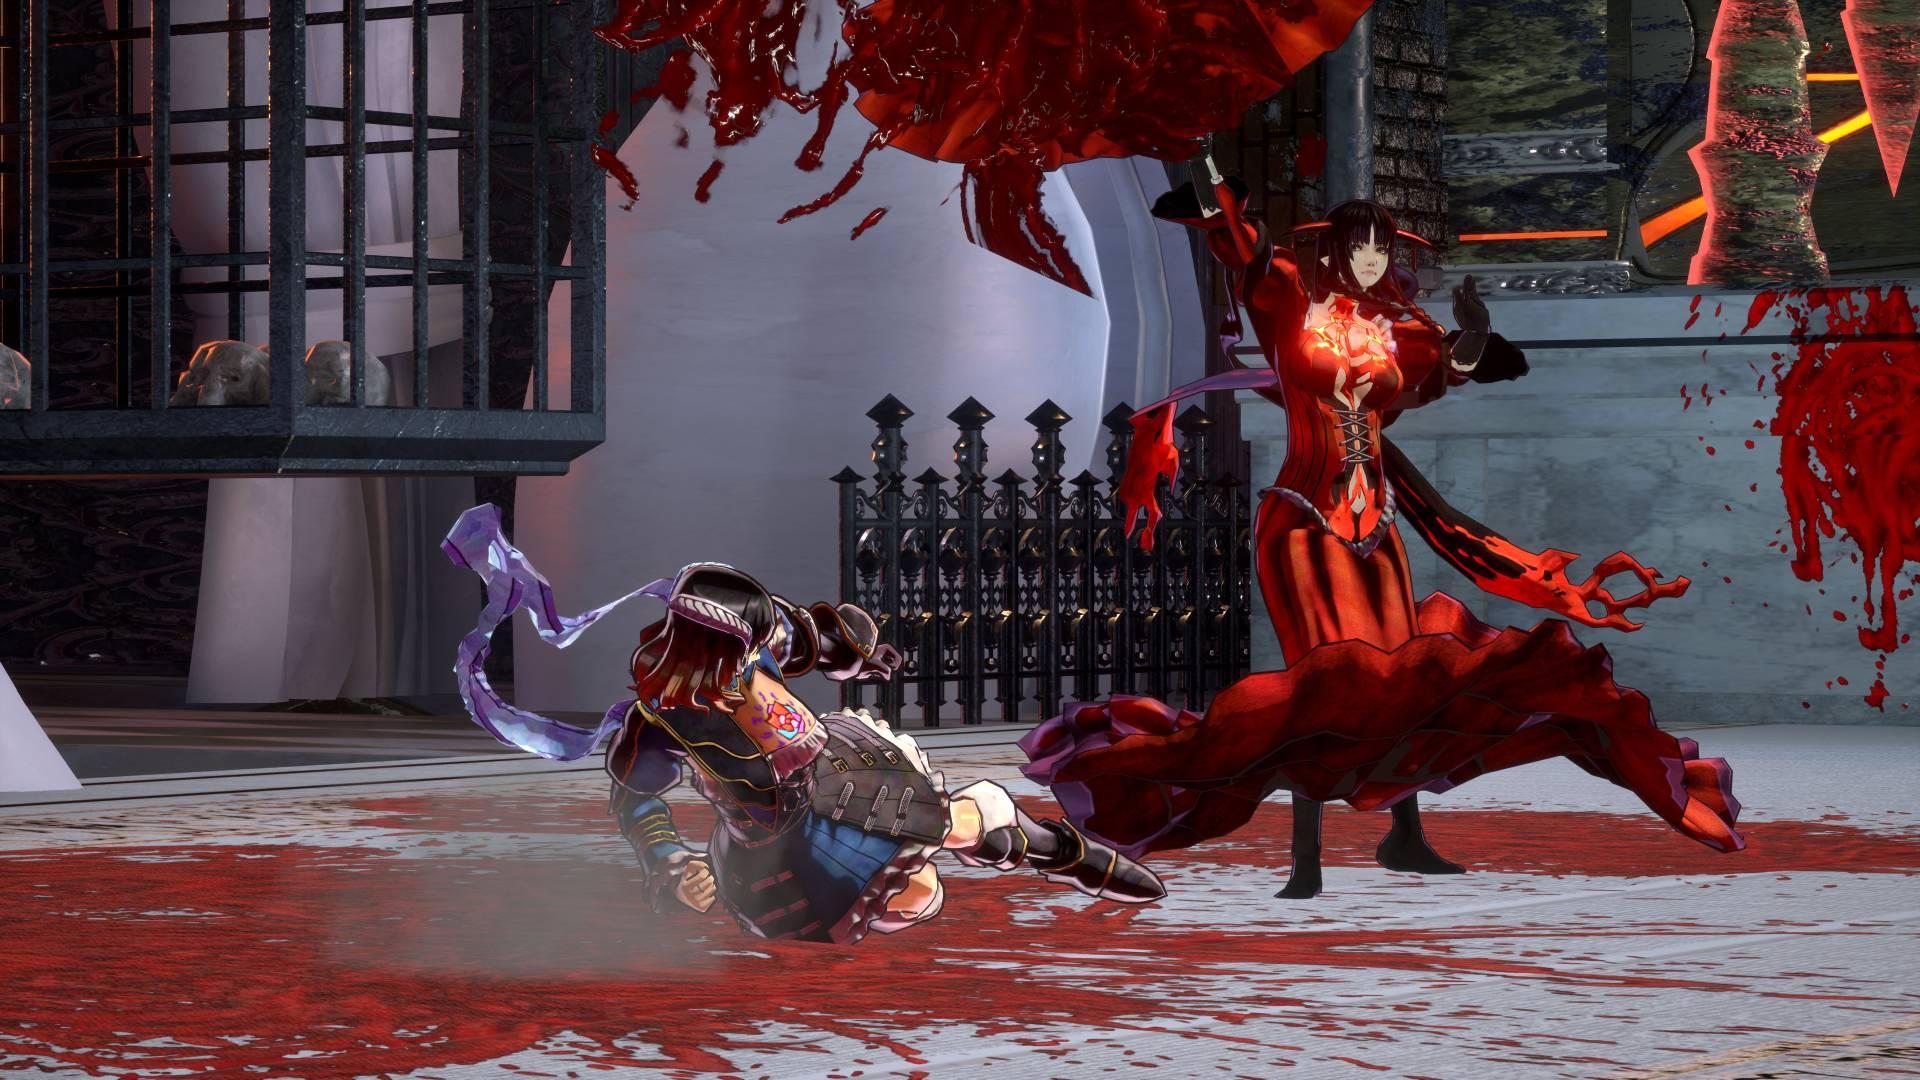 Обновление Bloodstained: Ritual of the Night для Switch всё ещё в работе